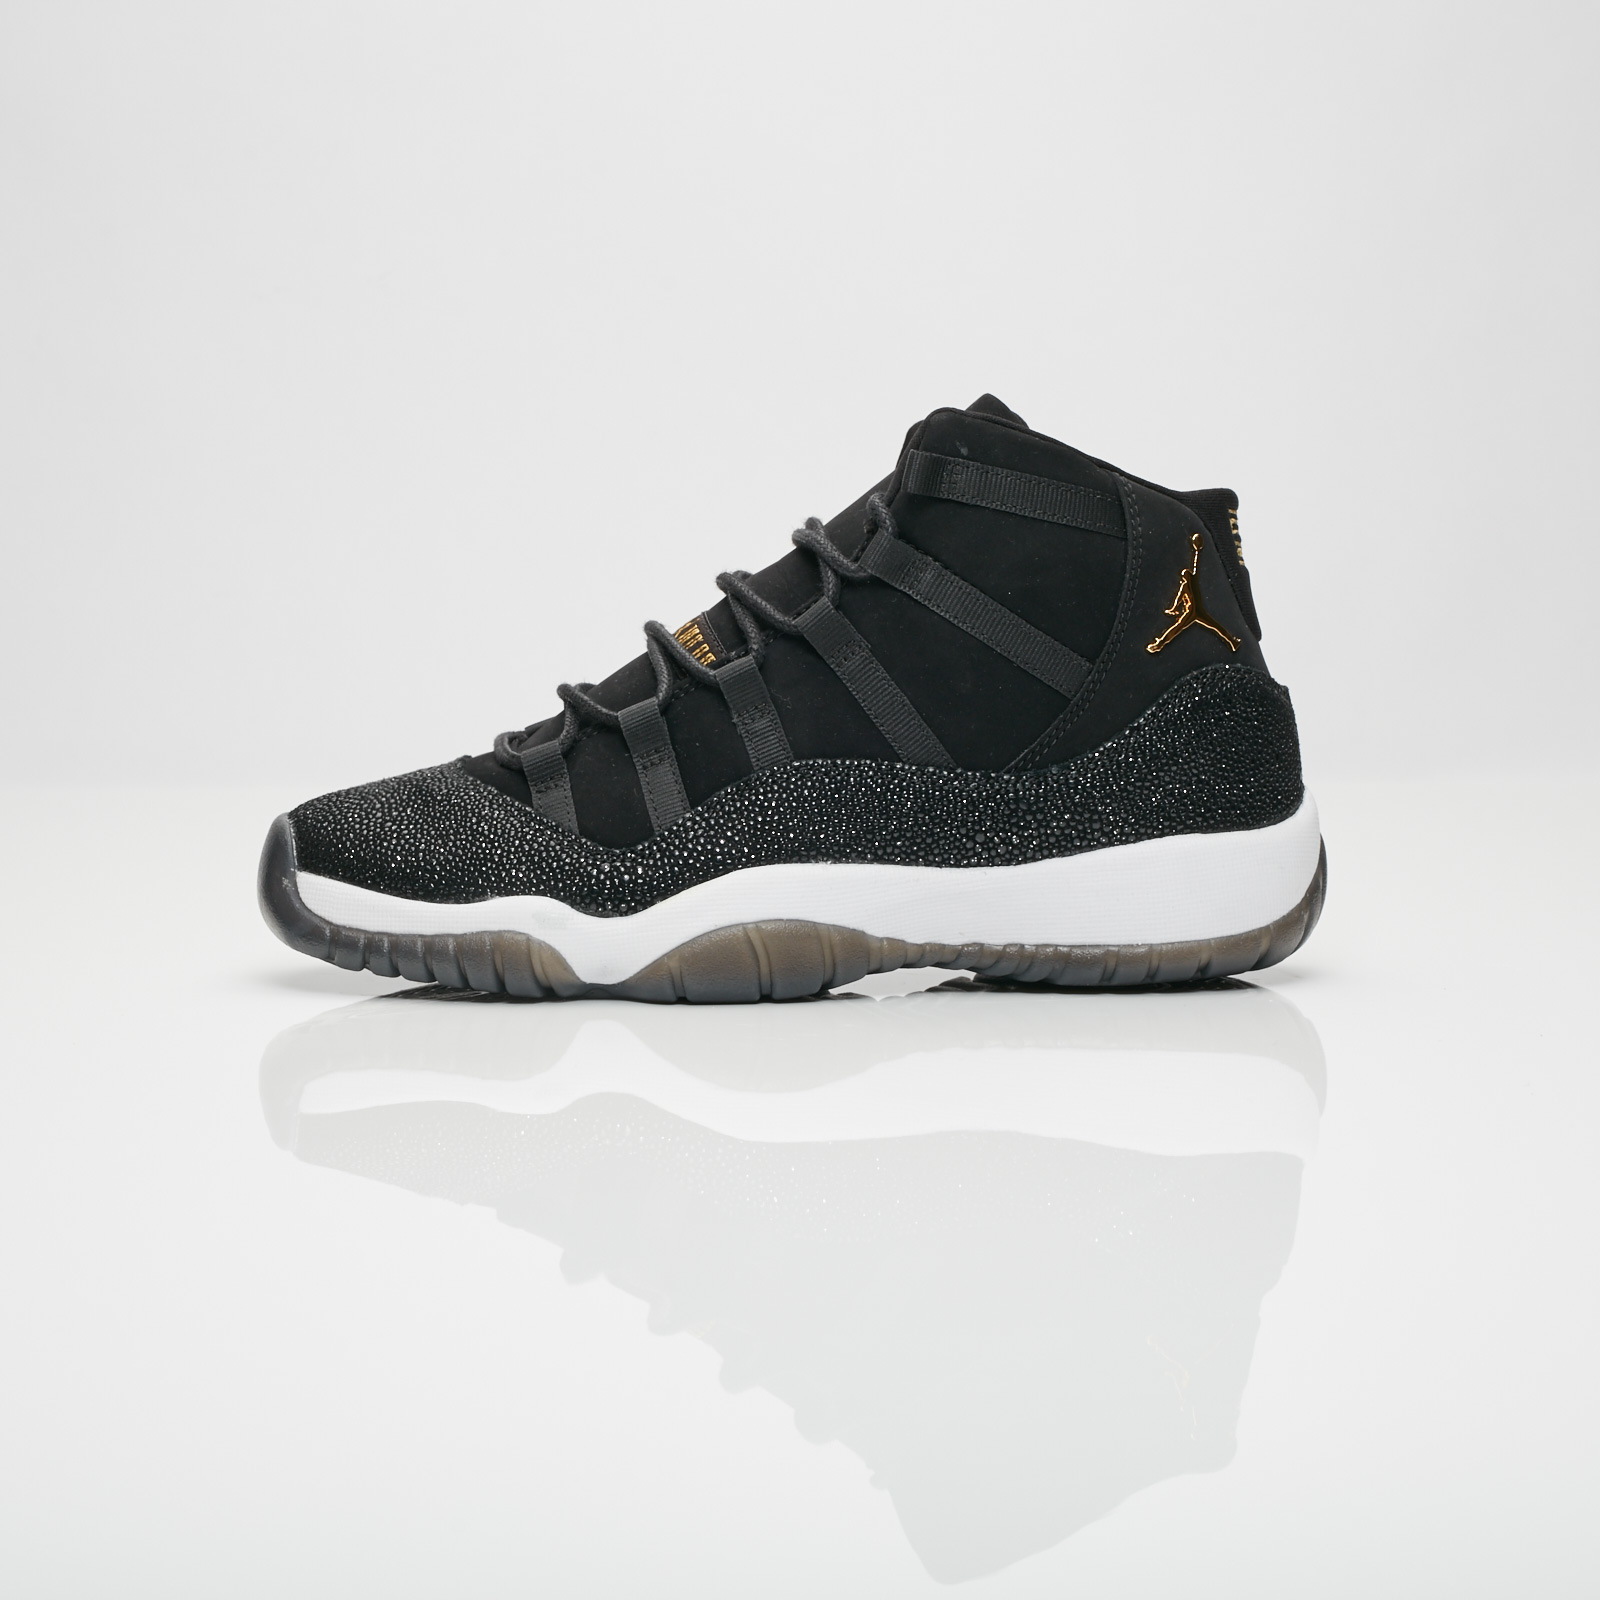 a9f416c15f3 Jordan Brand Air Jordan 11 Retro Premium HC - 852625-030 - Sneakersnstuff |  sneakers & streetwear online since 1999